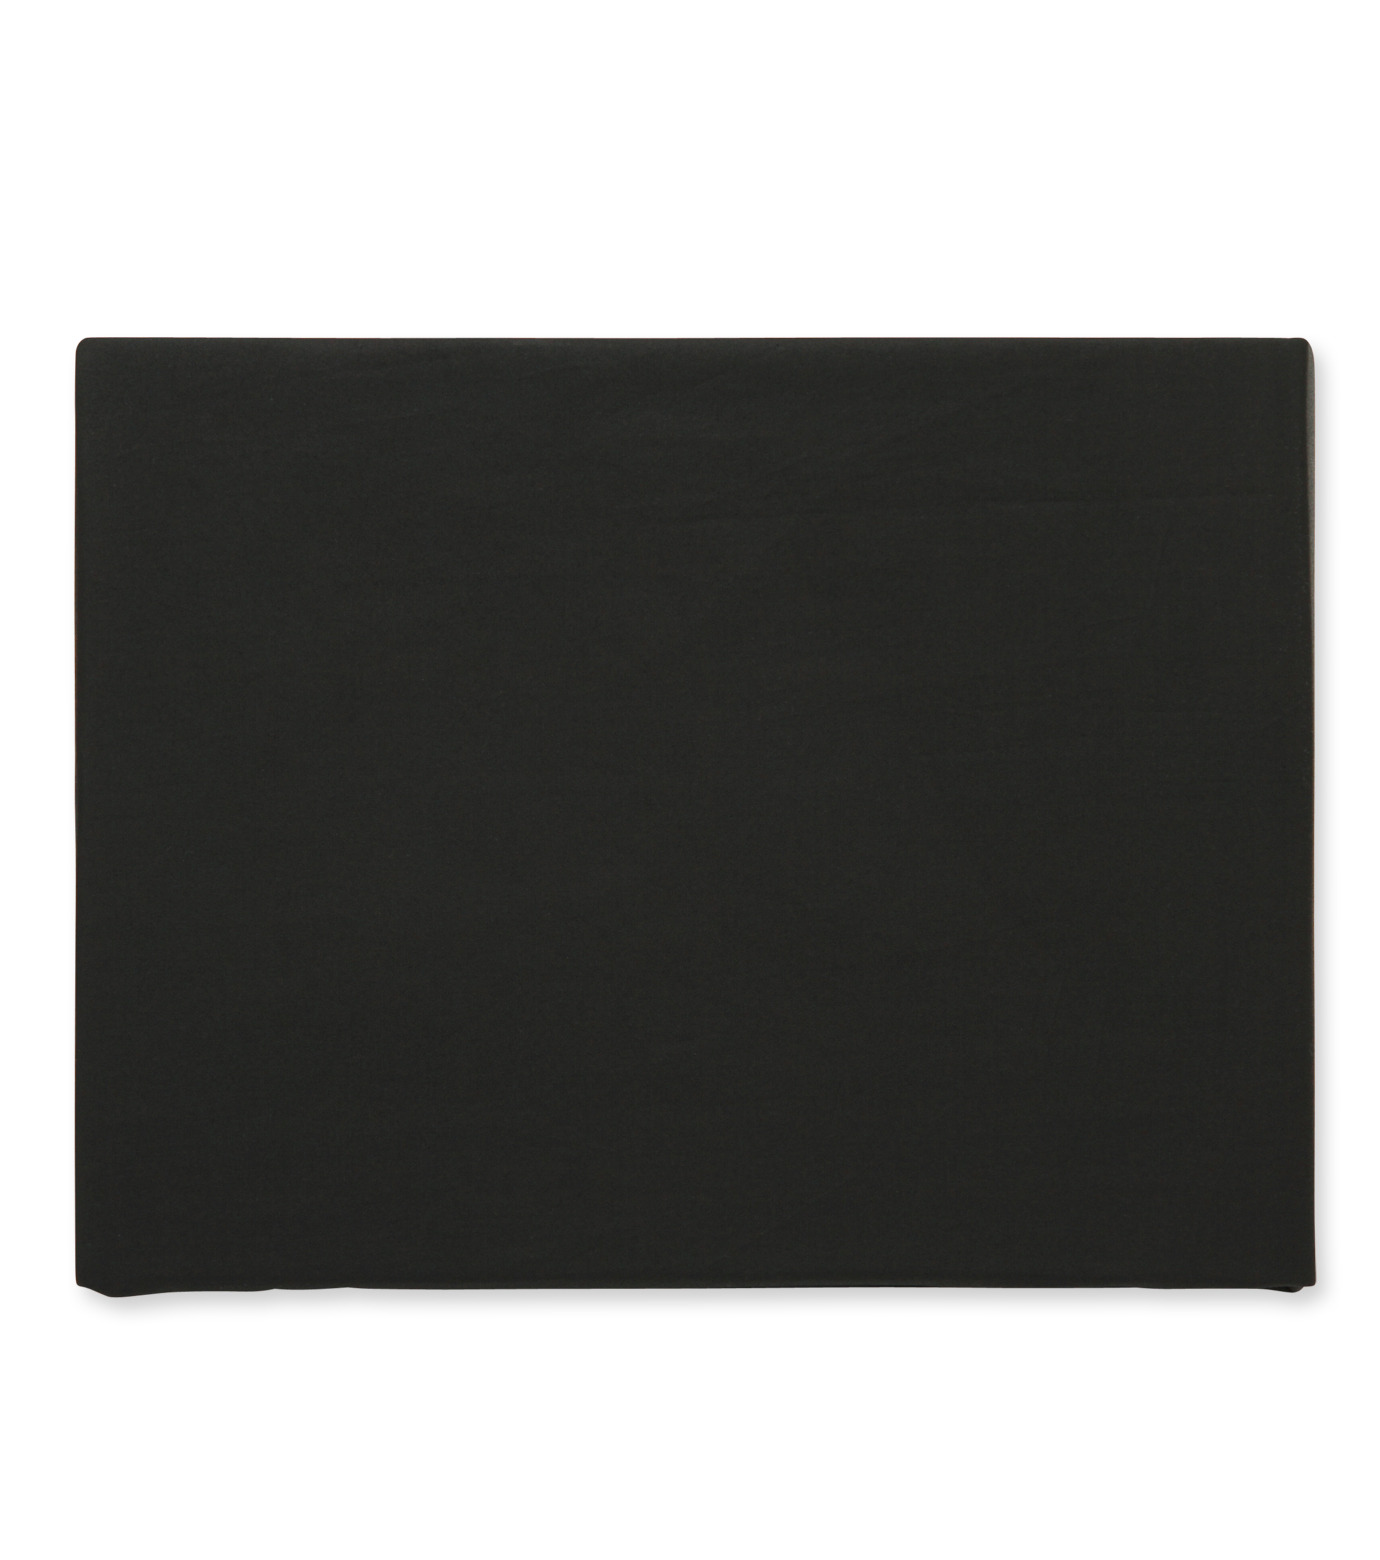 HEY YOU !(ヘイユウ)のBox sheet1/double-BLACK(インテリア/interior)-box-sheet-D-13 拡大詳細画像1